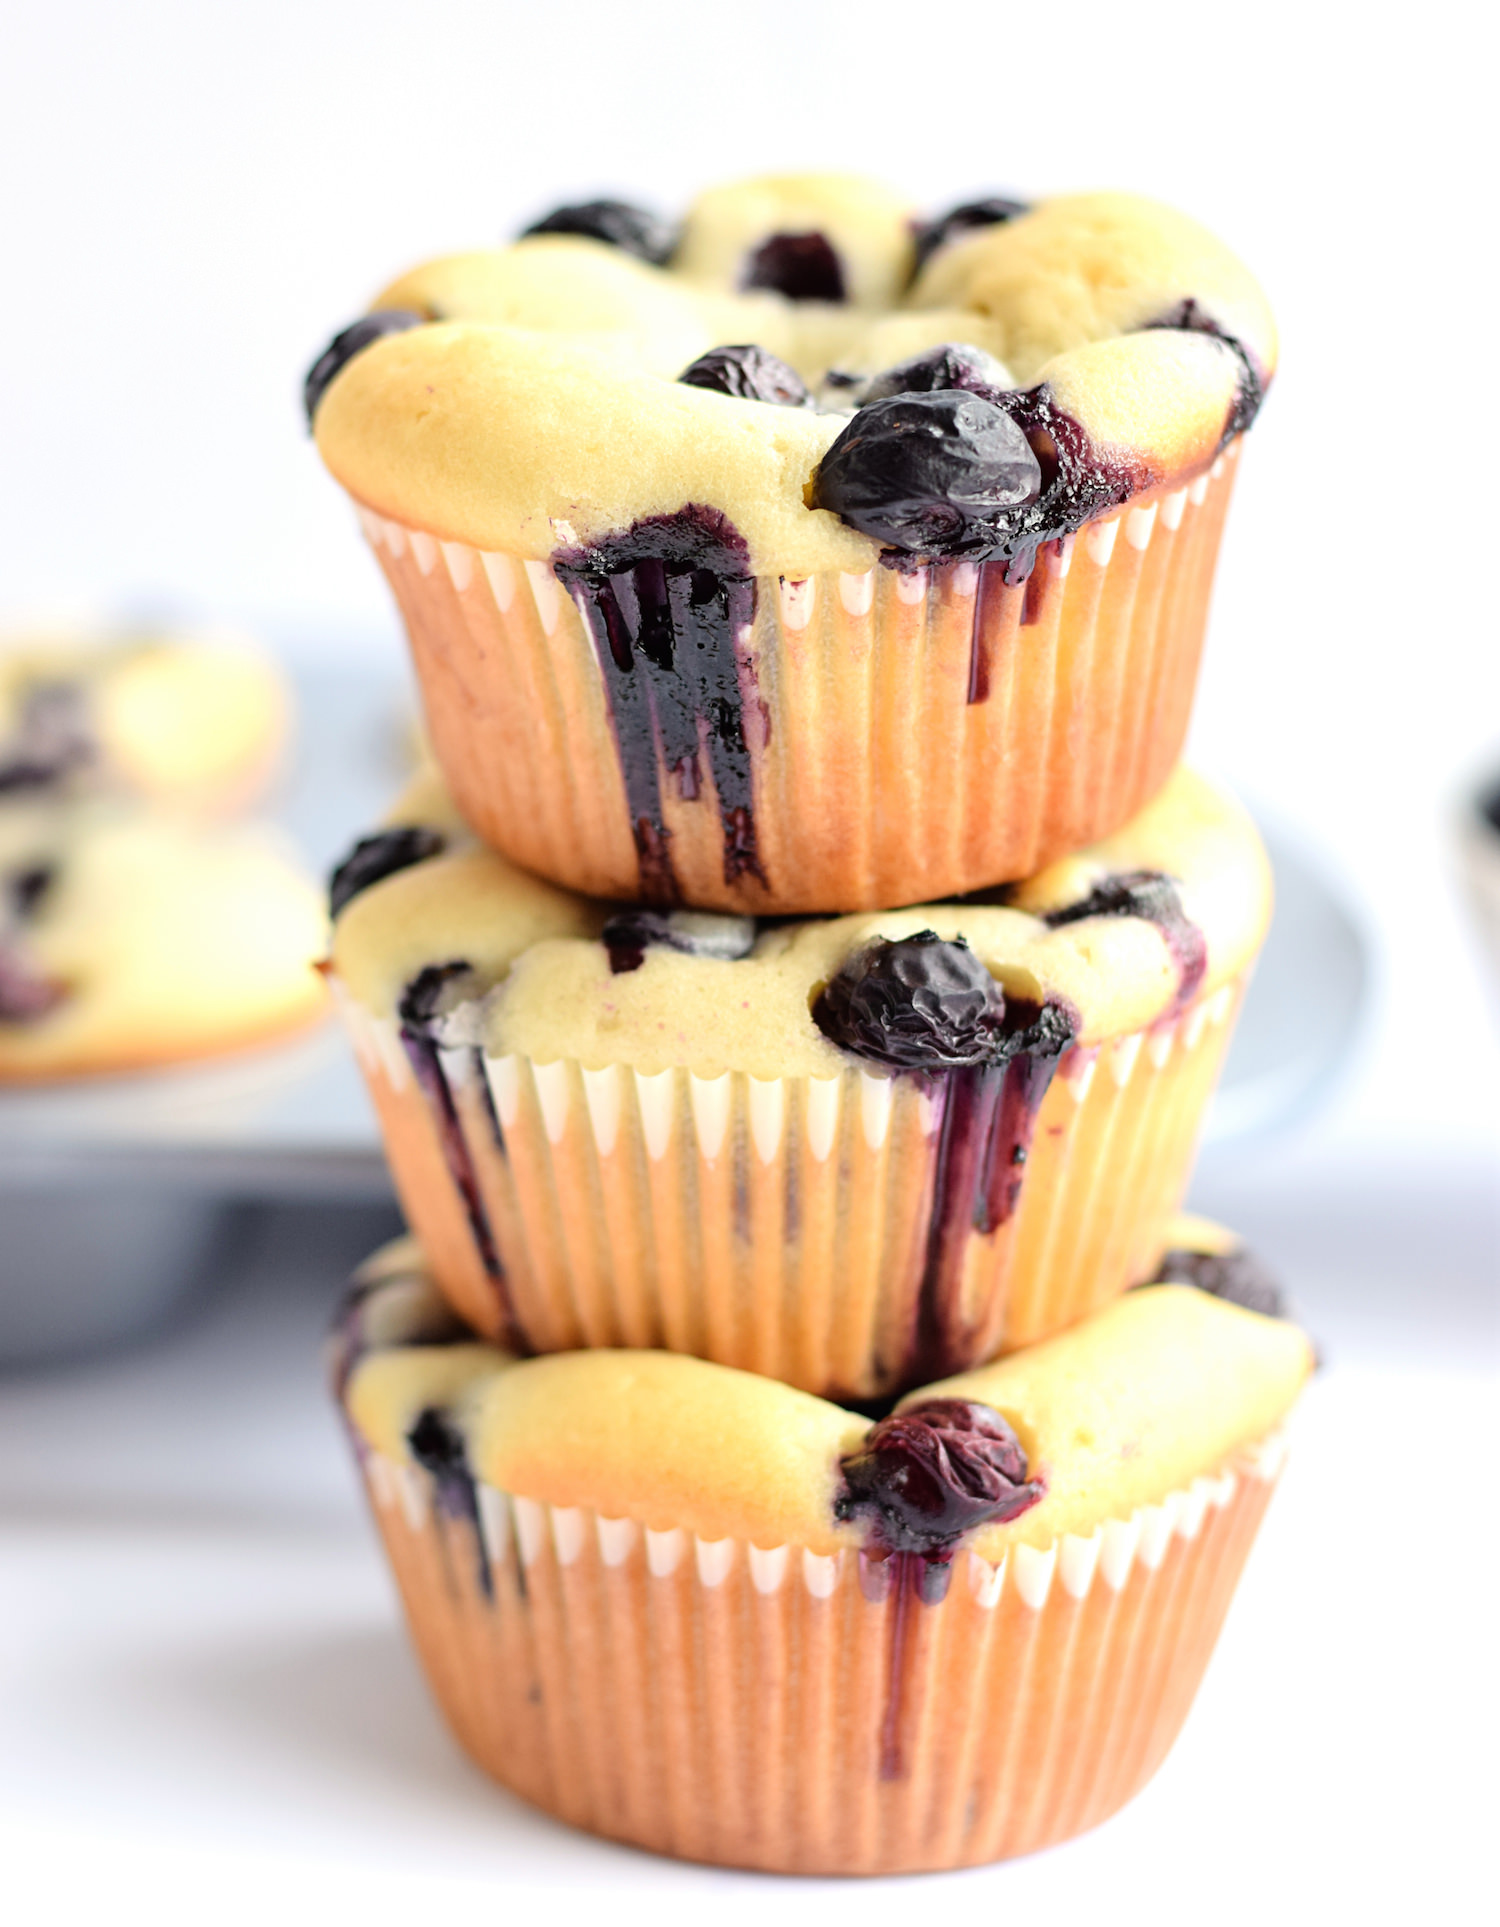 Soft and Moist Blueberry Muffins | TrufflesandTrends.com